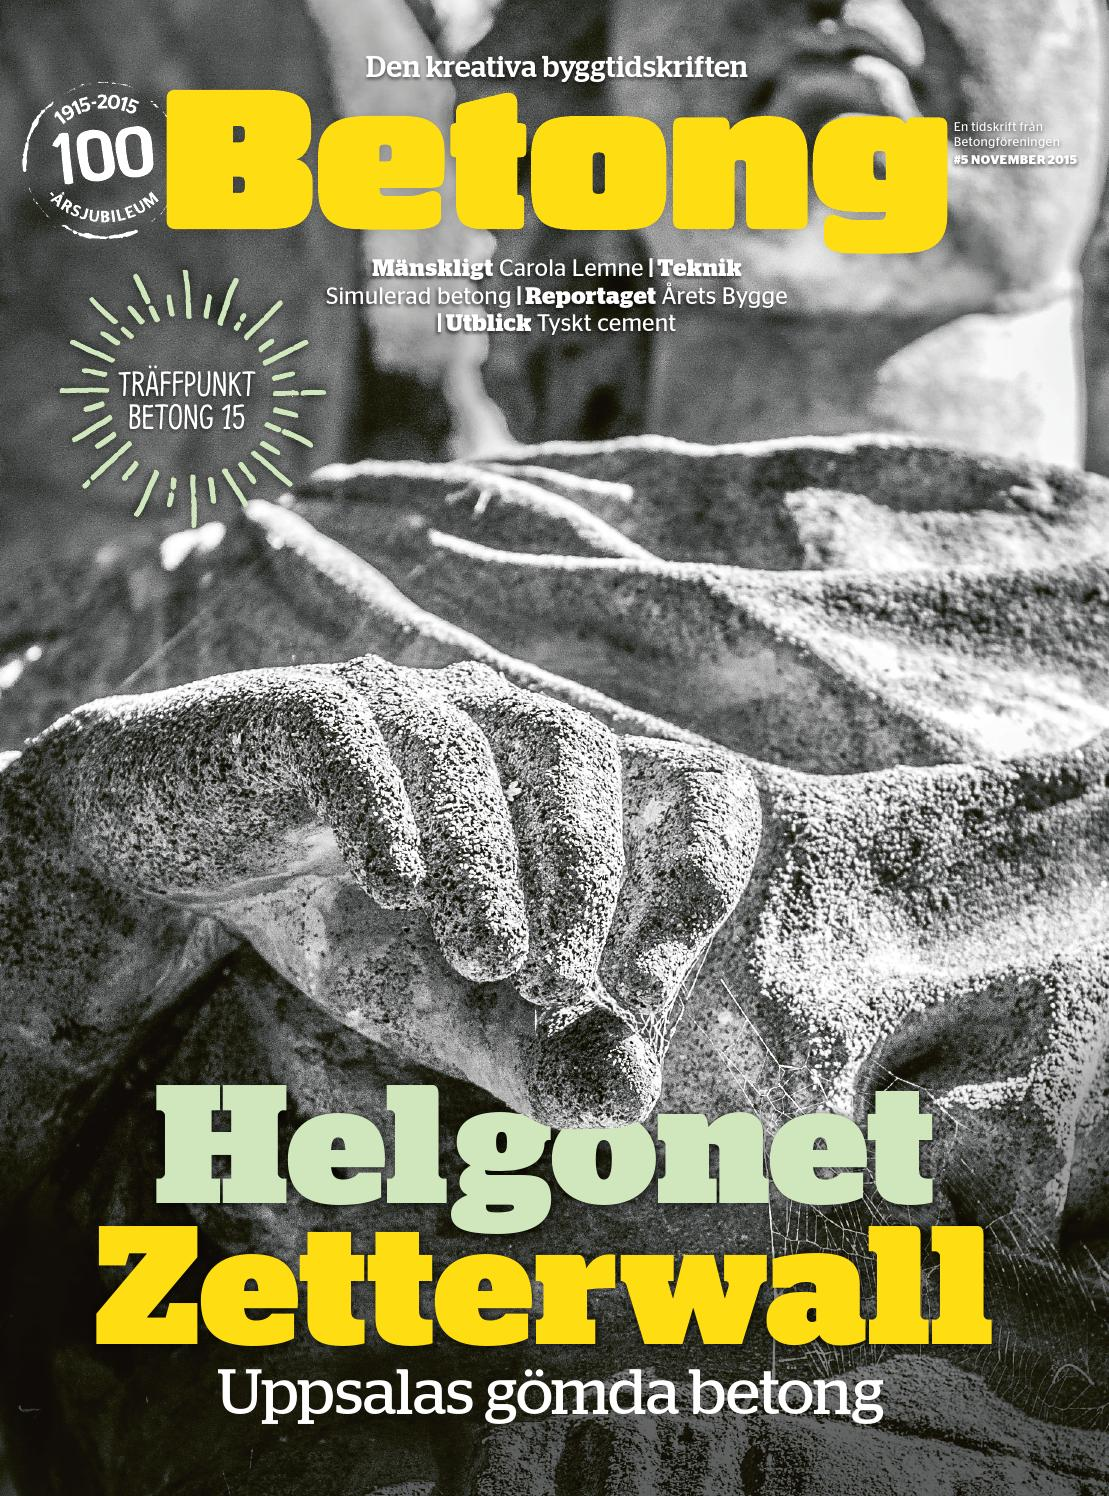 Tidskriften betong 4 2014 by tidskriften betong   issuu